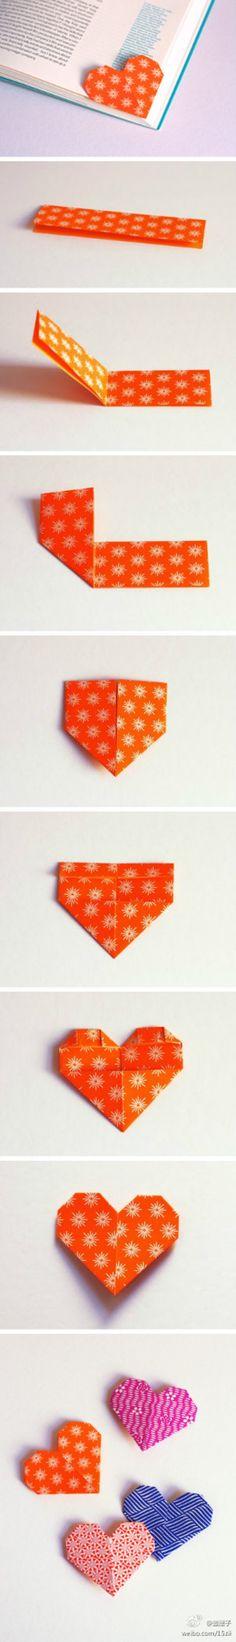 DIY handmade heart-shaped origami bookmark Tutorial